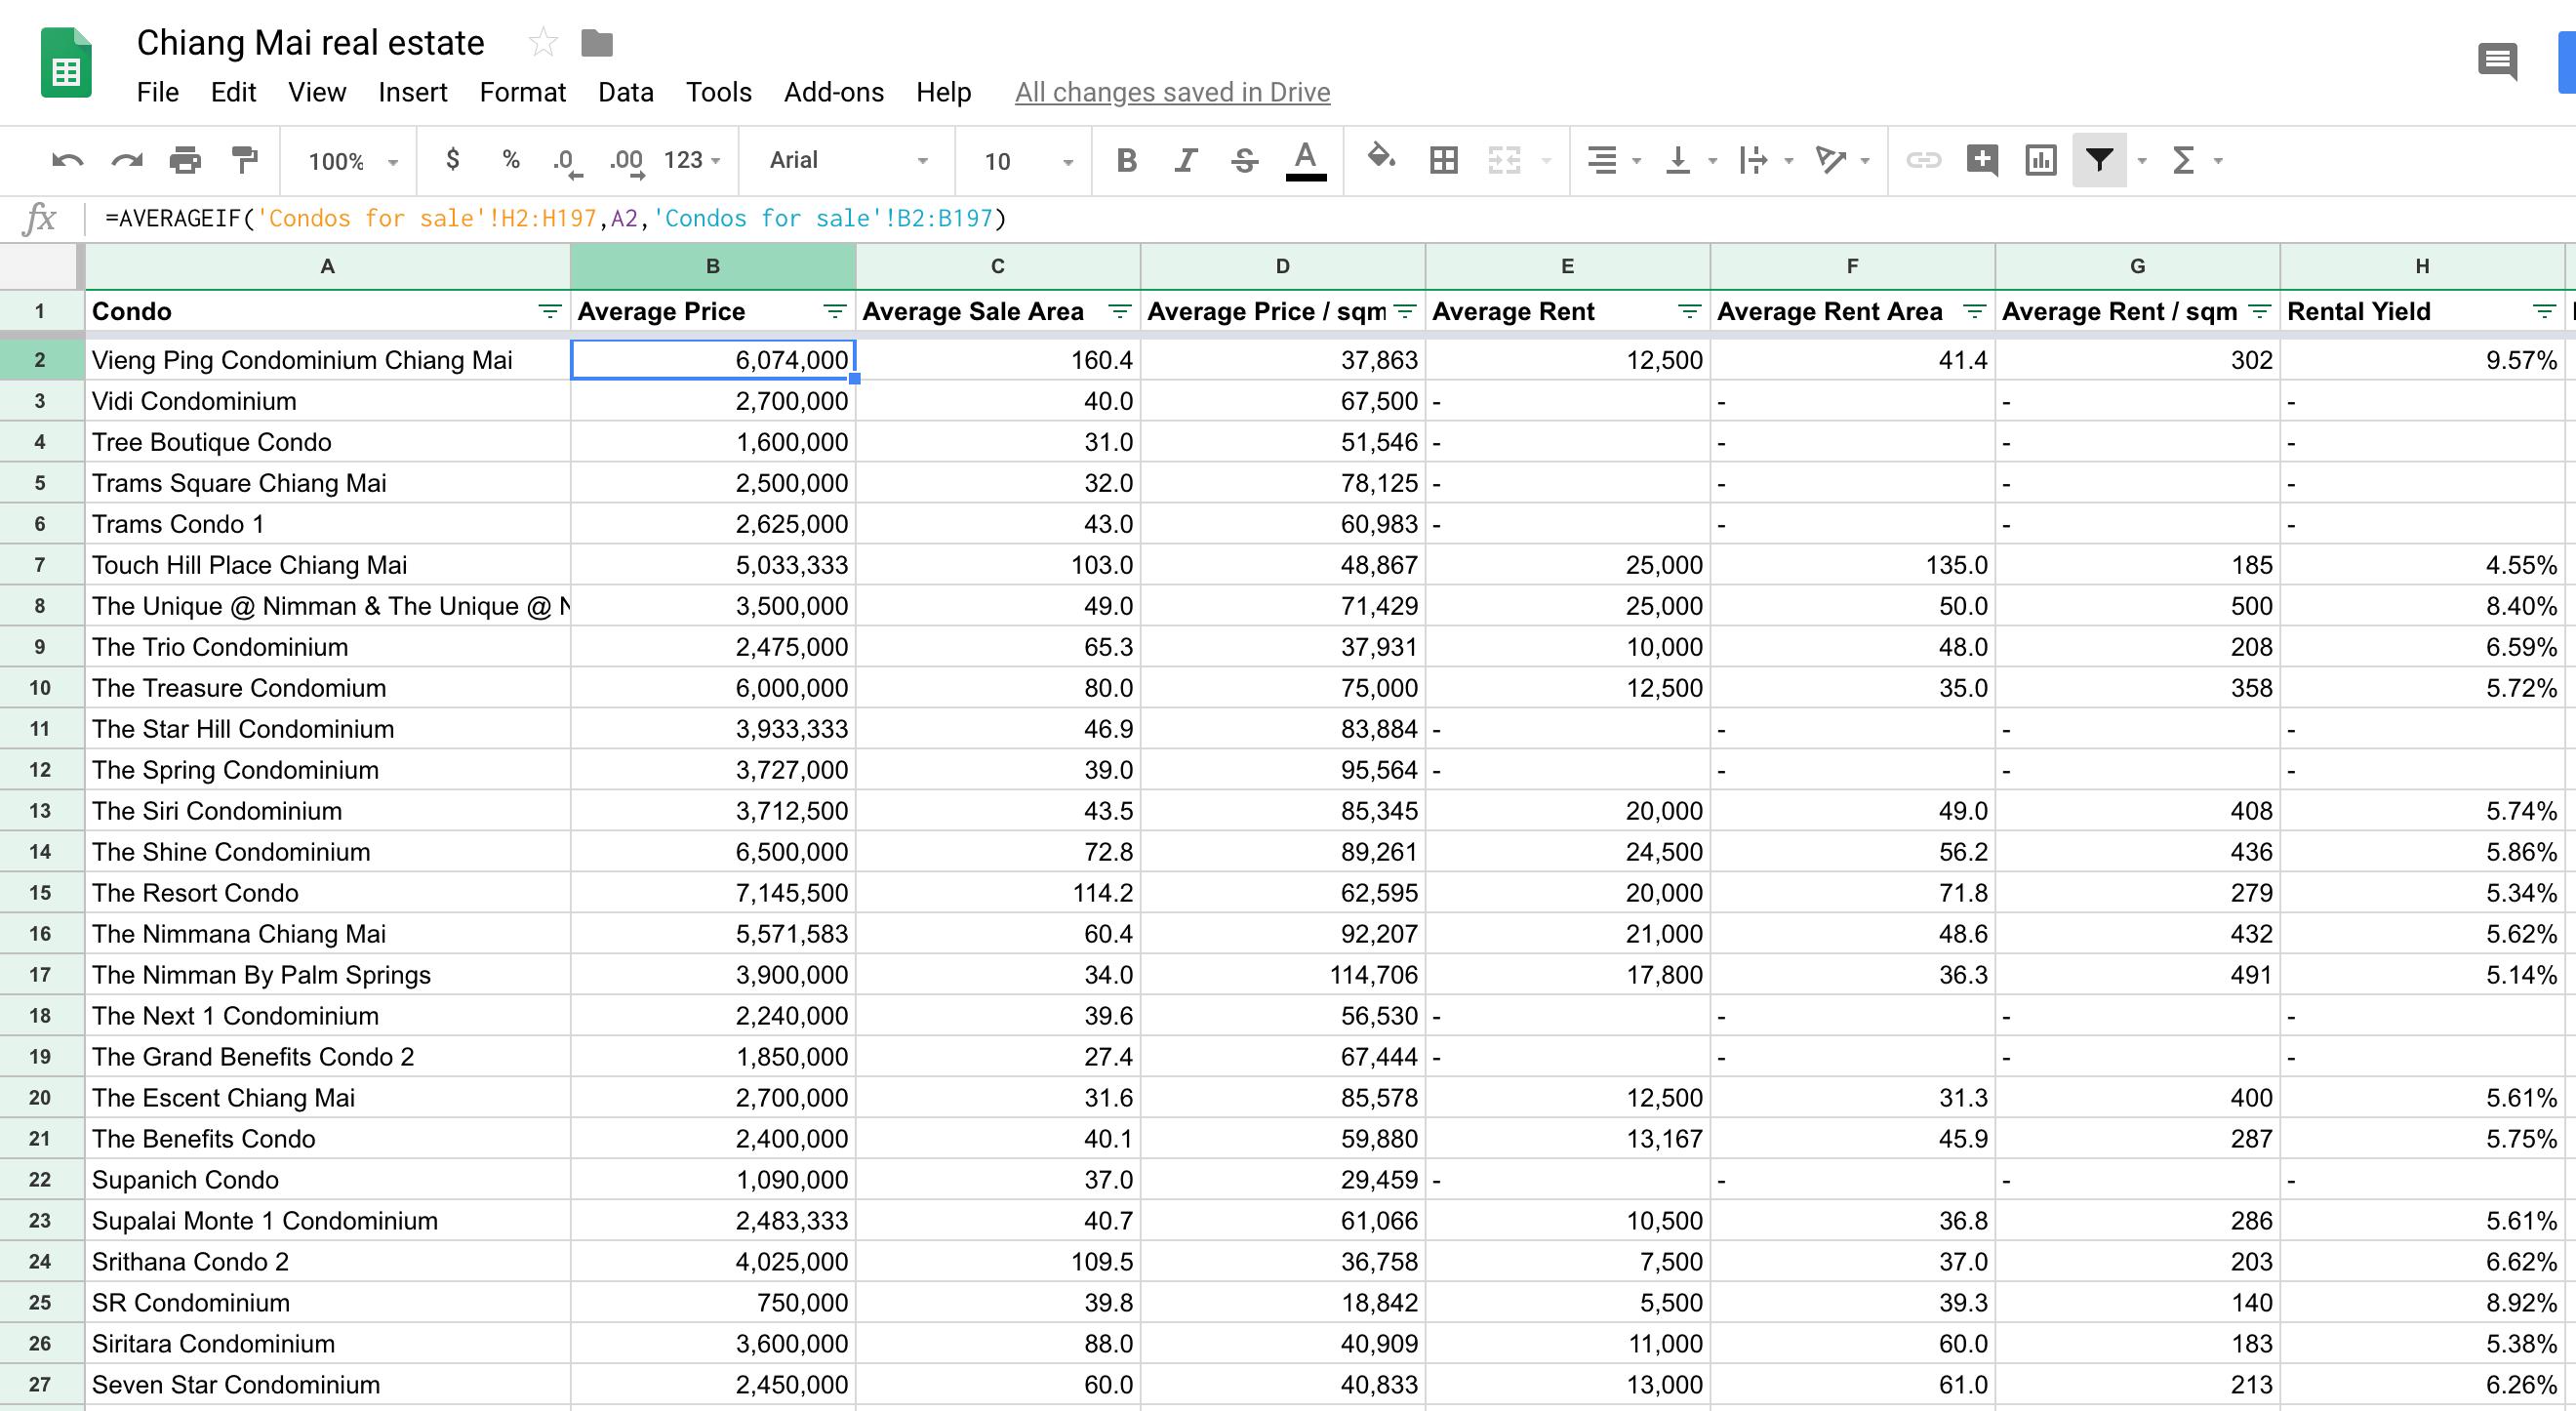 My spreadsheet